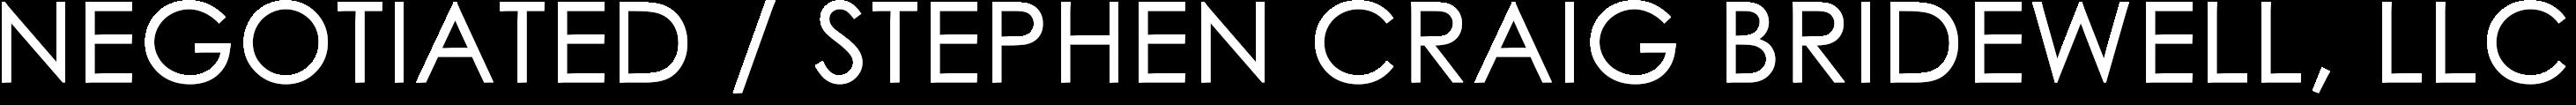 NEGOTIATED / STEPHEN CRAIG BRIDEWELL, LLC - HOME